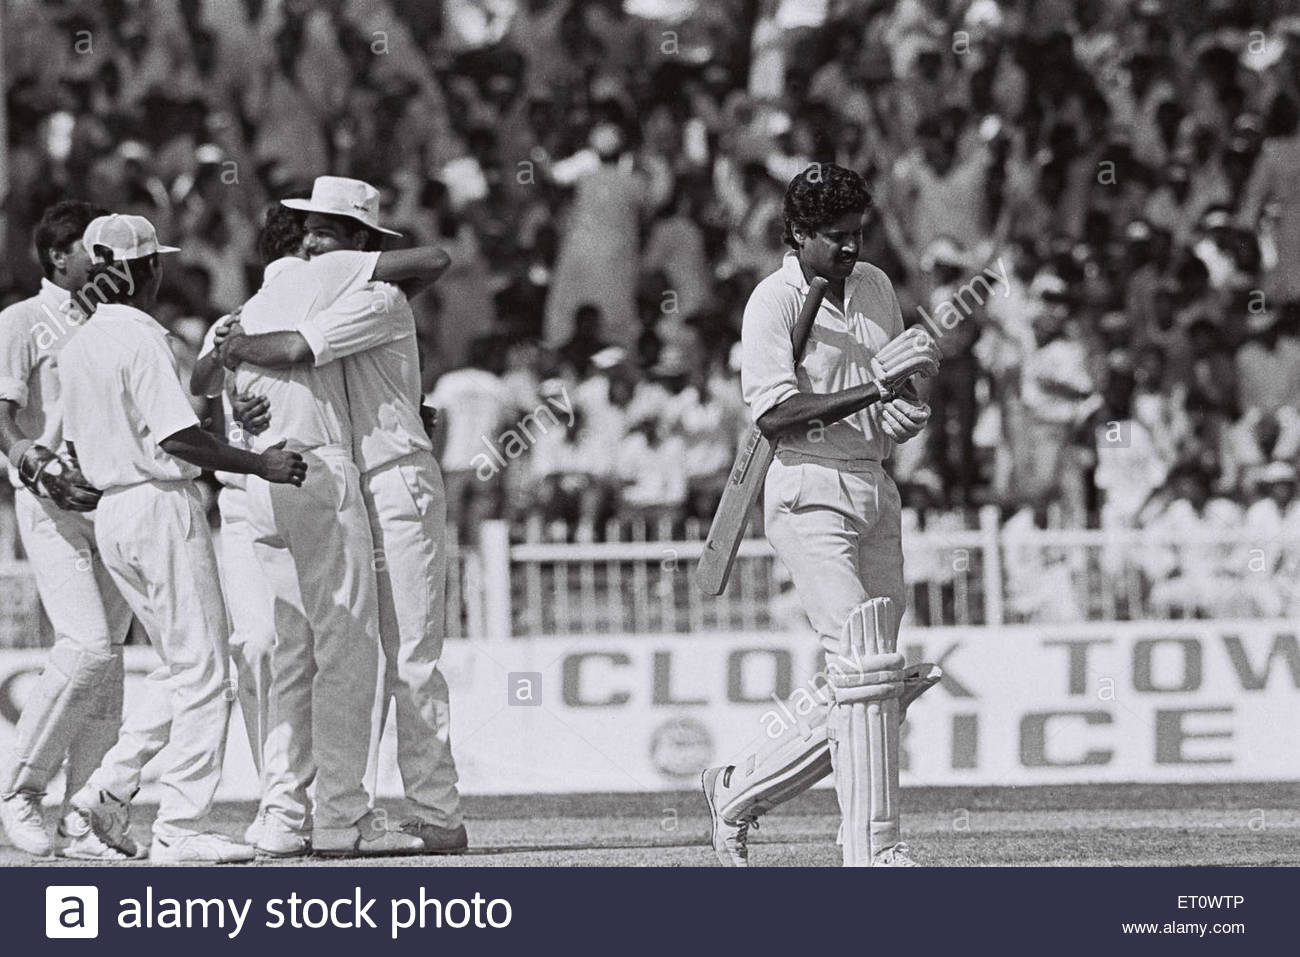 Kapil Dev ; India versus Pakistan ; cricket match ; Sharjah Cup 1990 - Stock Image